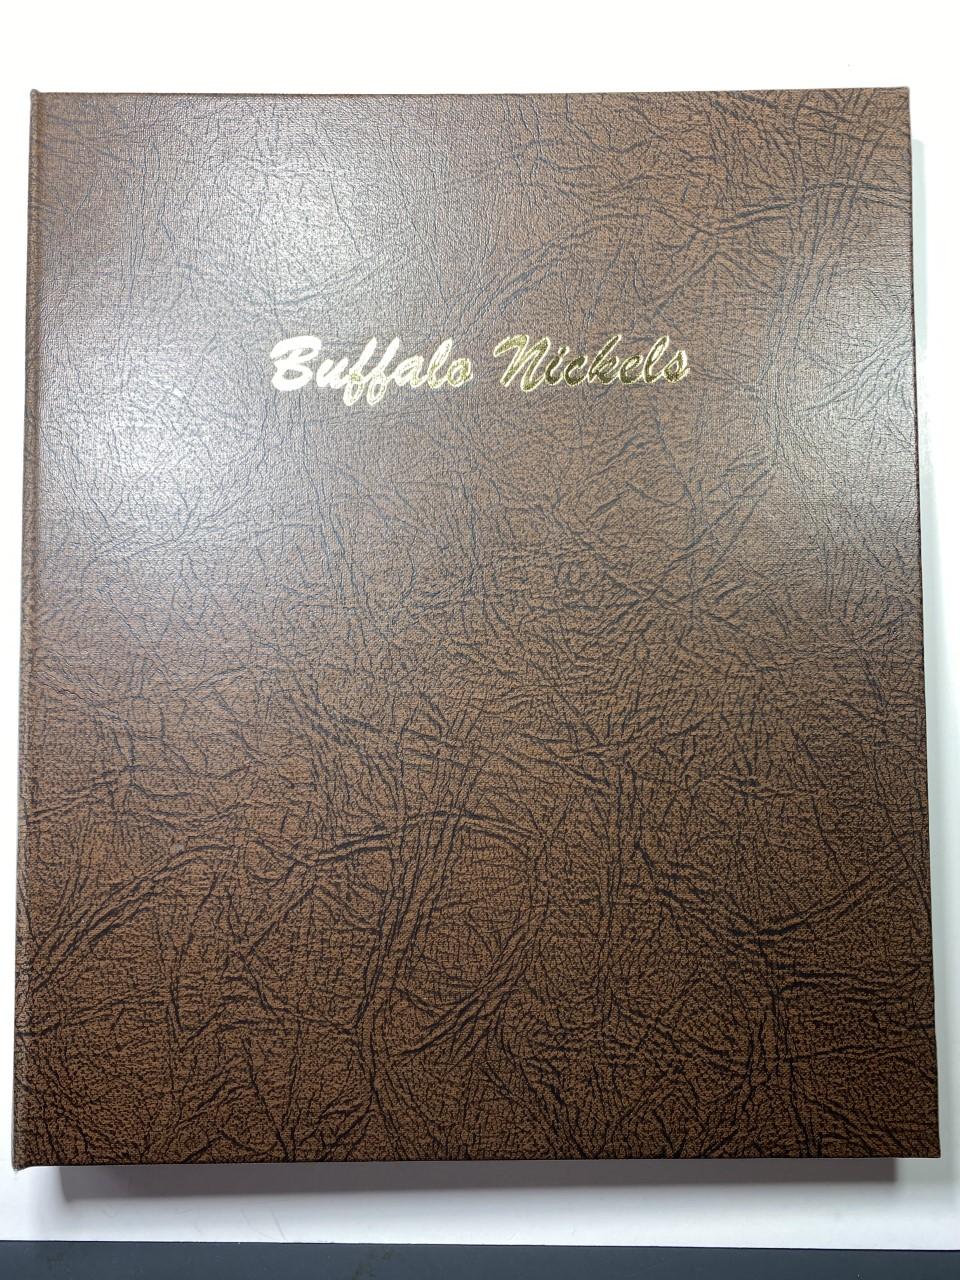 BUFFALO NICKELS DANSCO 7112 COIN ALBUM U.S